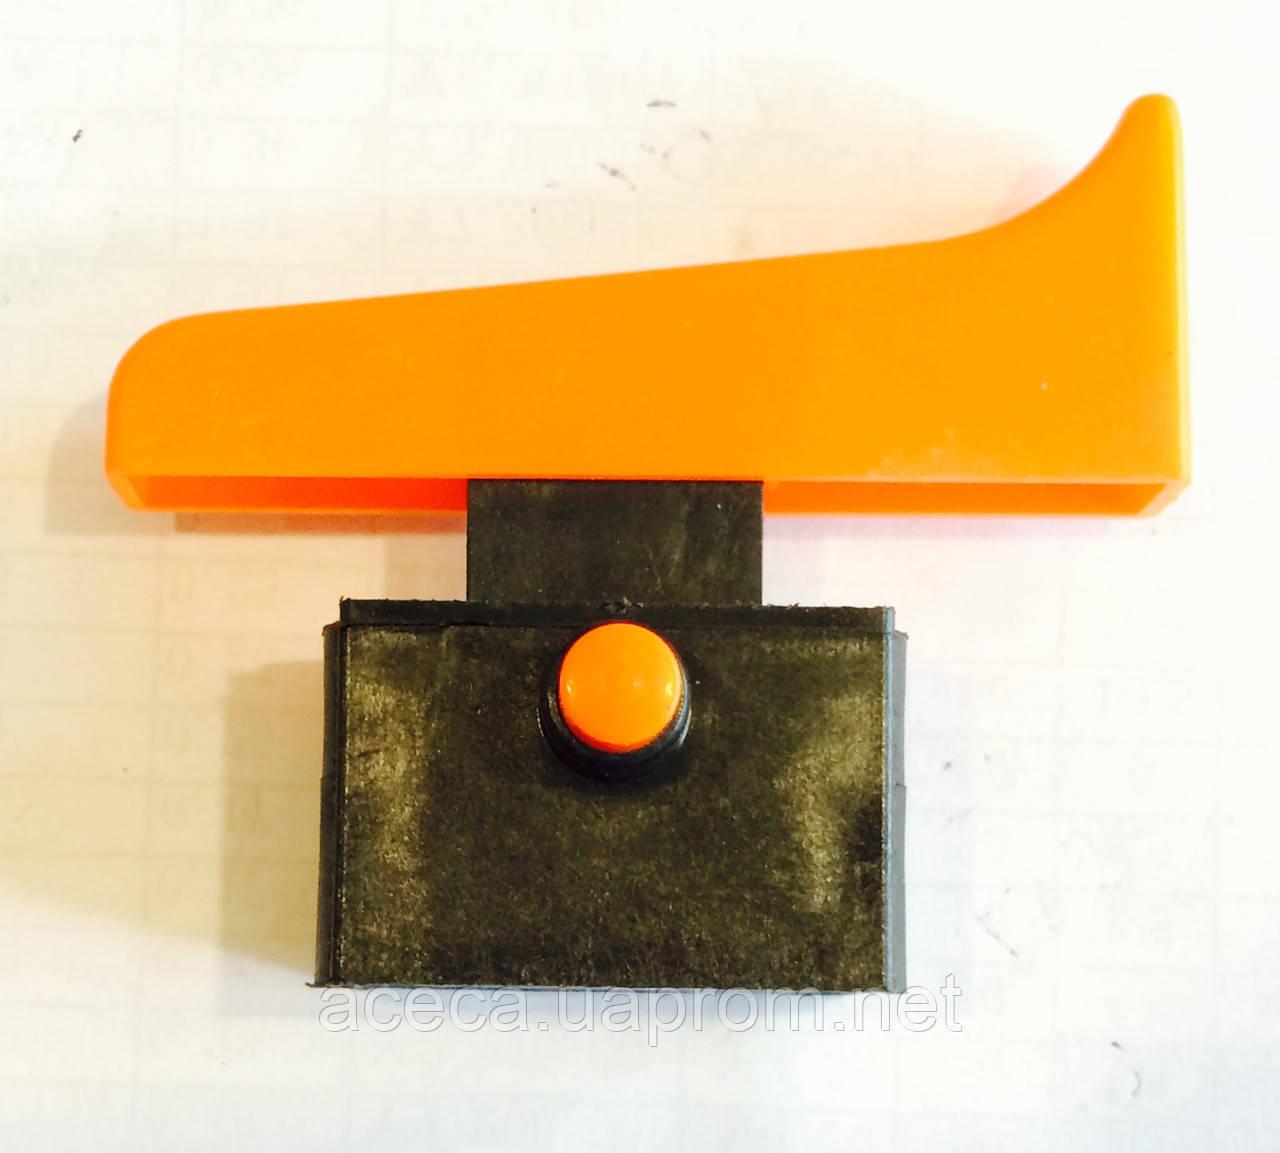 Кнопка включения УШМ Stern 230 (тонкий фиксатор)